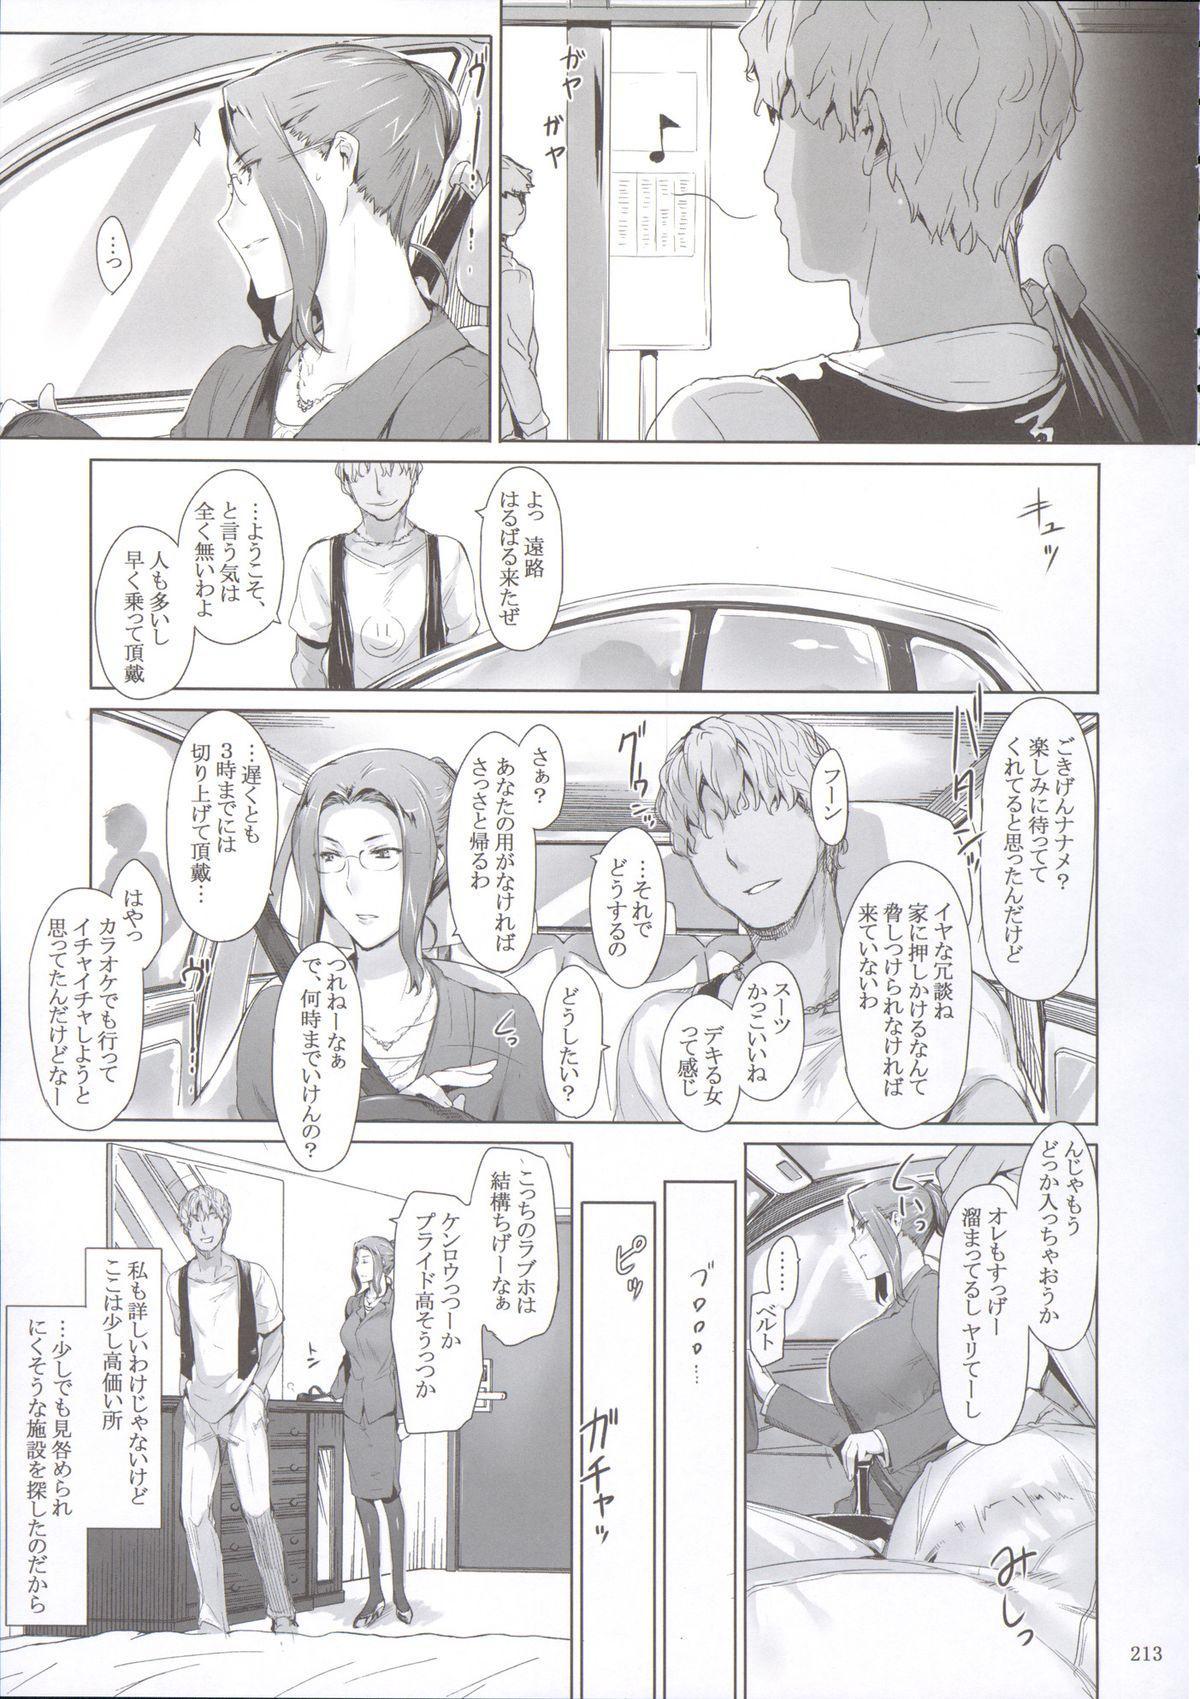 (C86) [MTSP (Jin)] Tachibana-san-chi no Dansei Jijou Matome Ban [Incomplete] 11